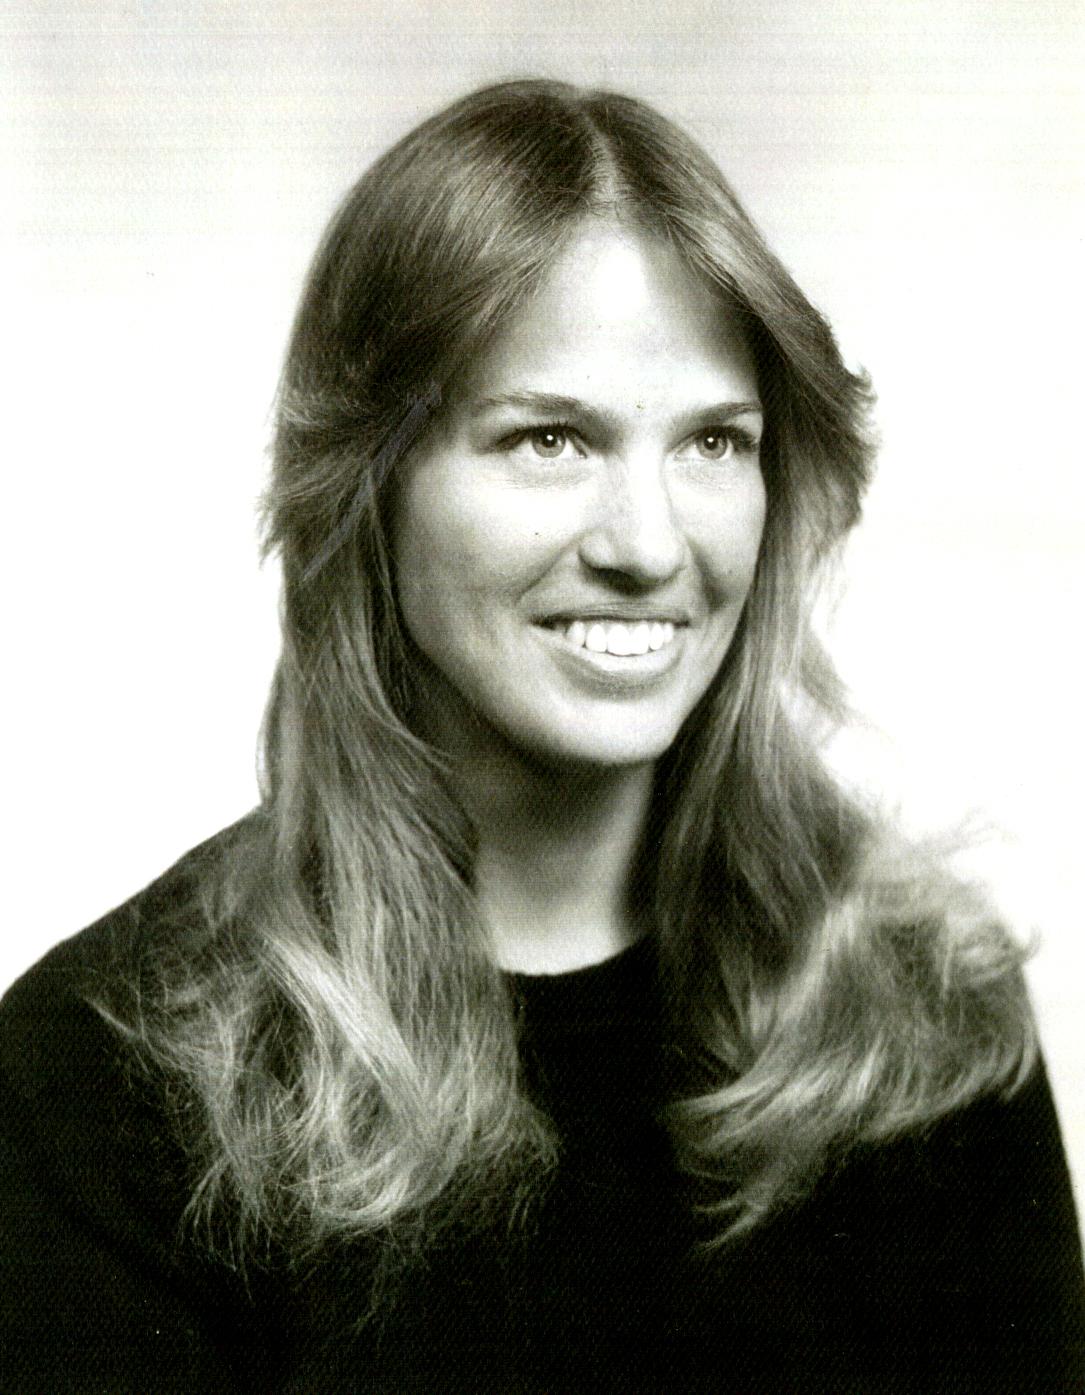 Cold case photo of Donna Kuzmaak